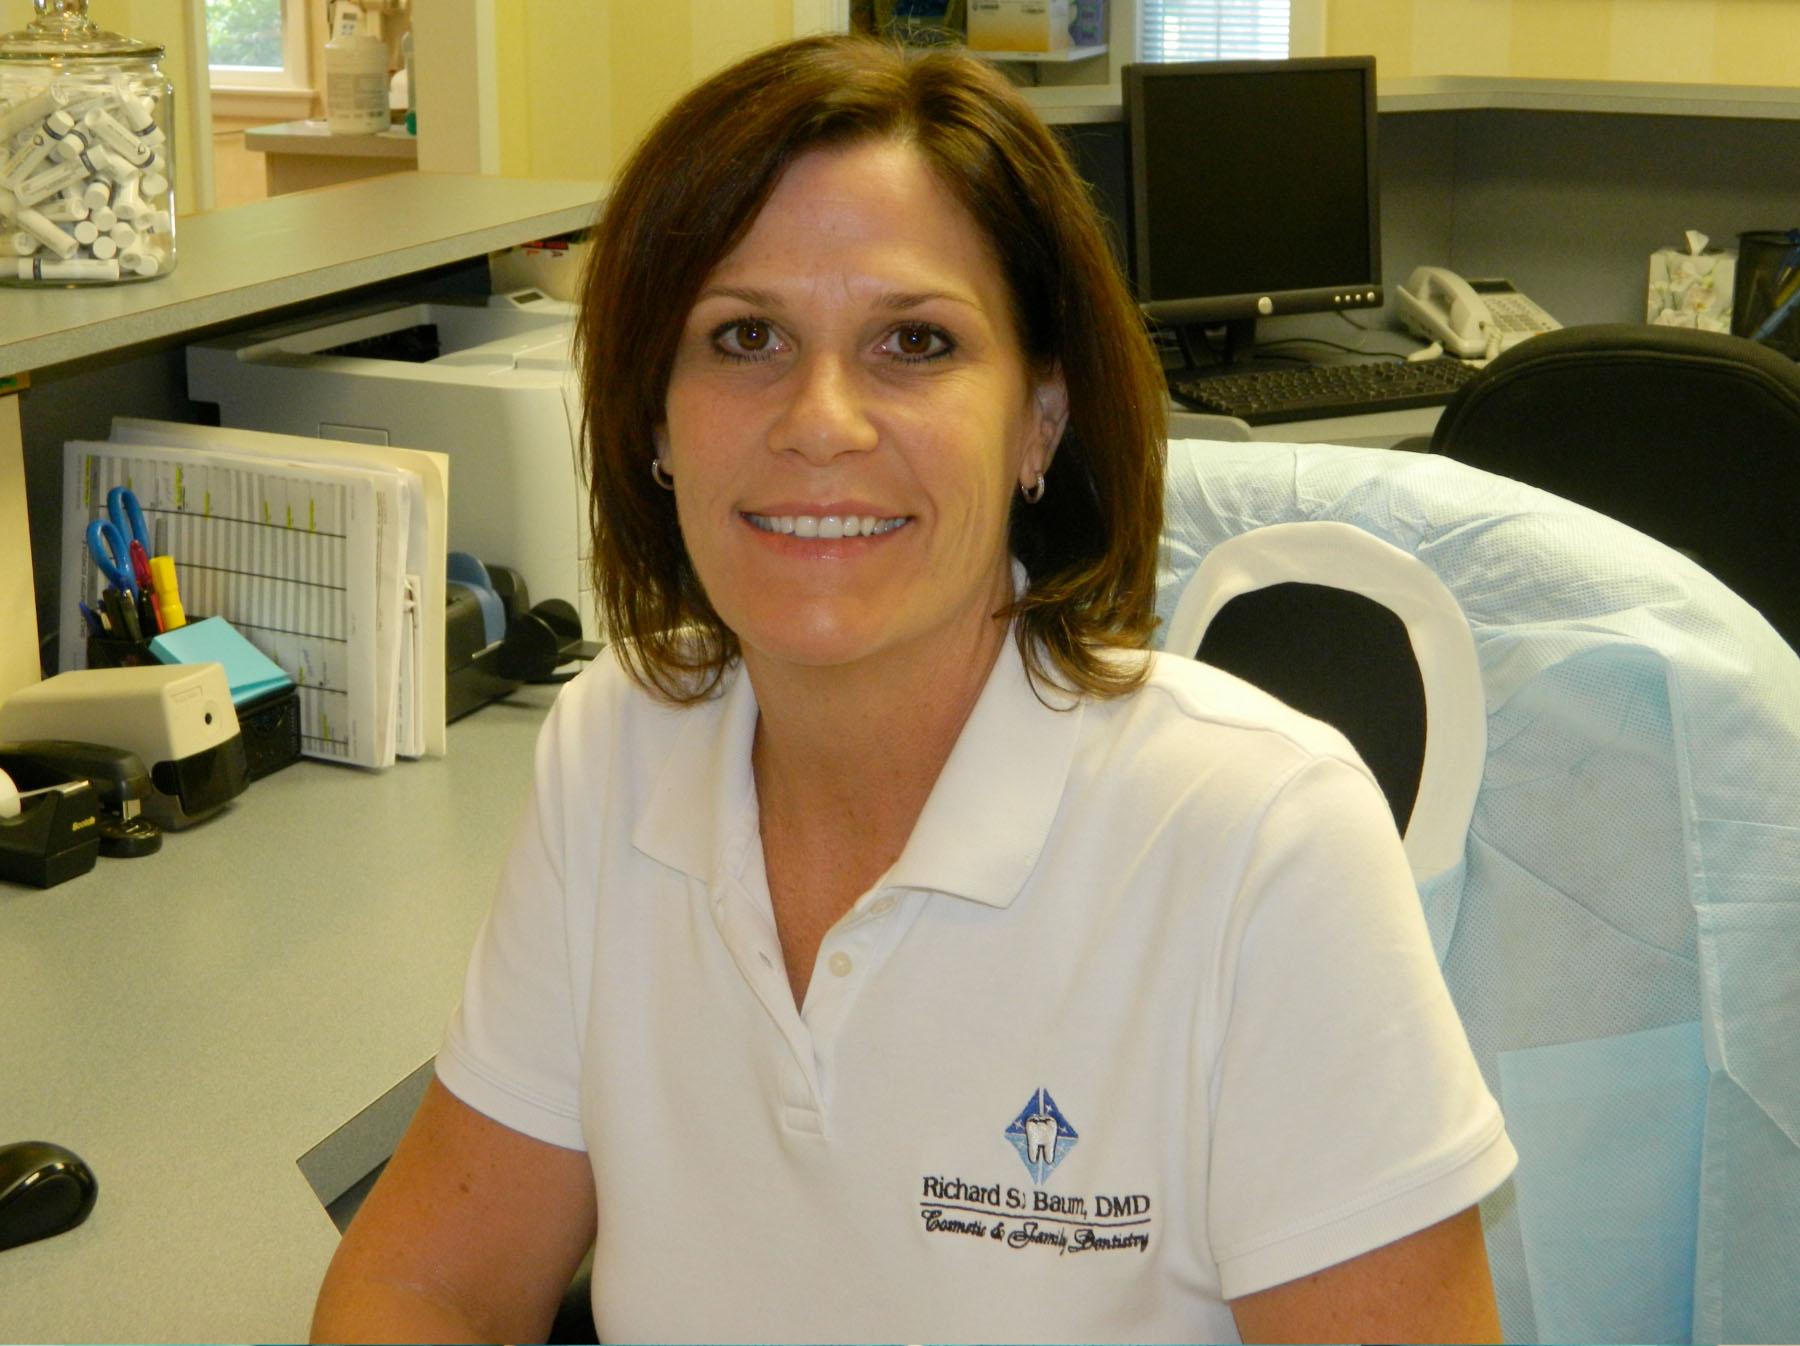 dr-baum-dentist-mary-lynn-tolomeo-office-manager